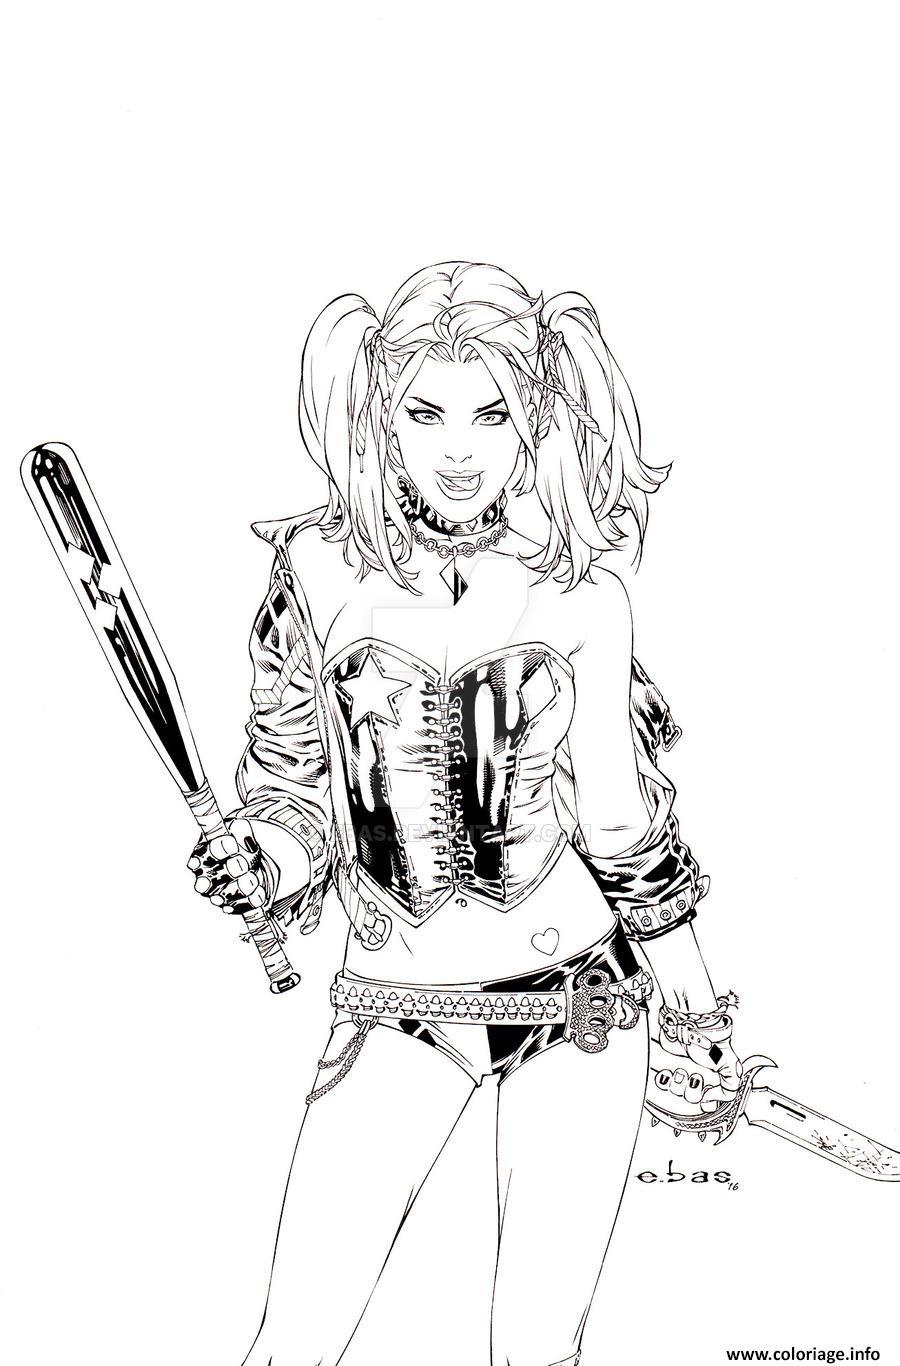 Coloriage Harley Quinn By Ebas Daaofp7 Dessin